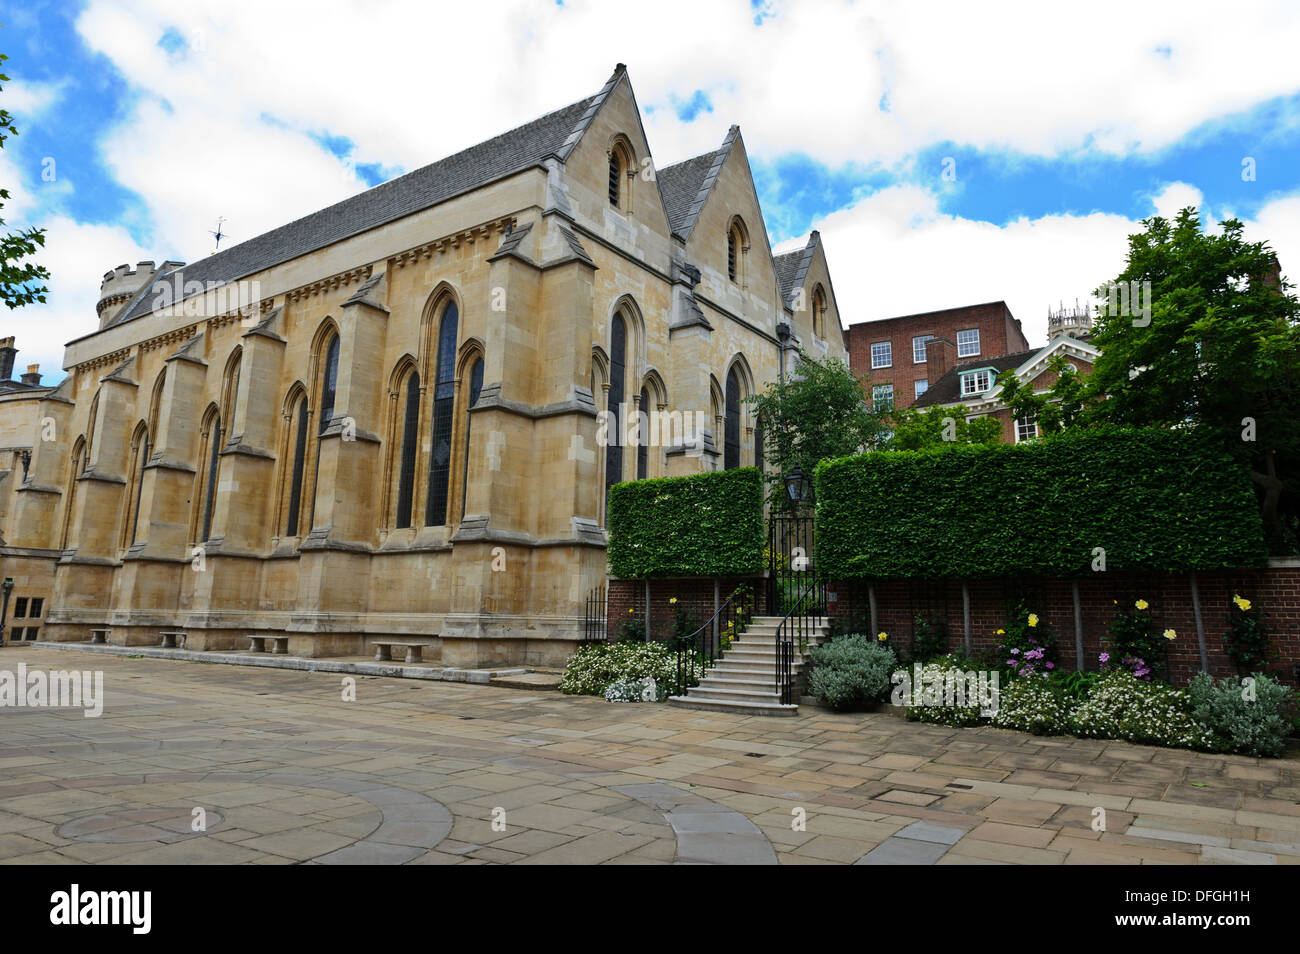 La iglesia del Temple, Londres, Inglaterra, Reino Unido. Imagen De Stock